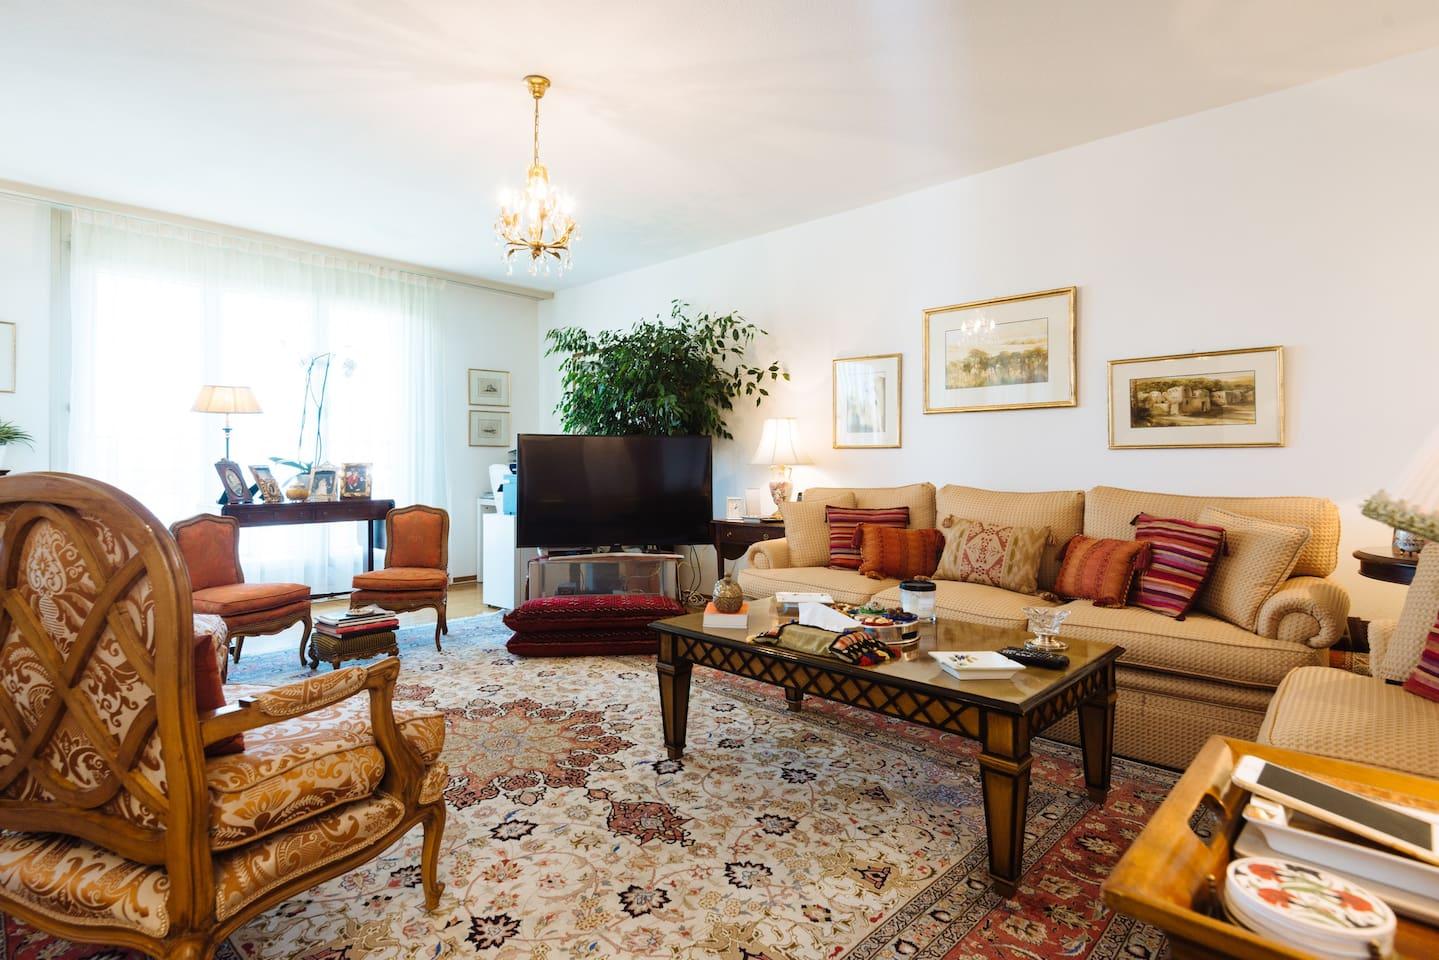 Brightness of the living room